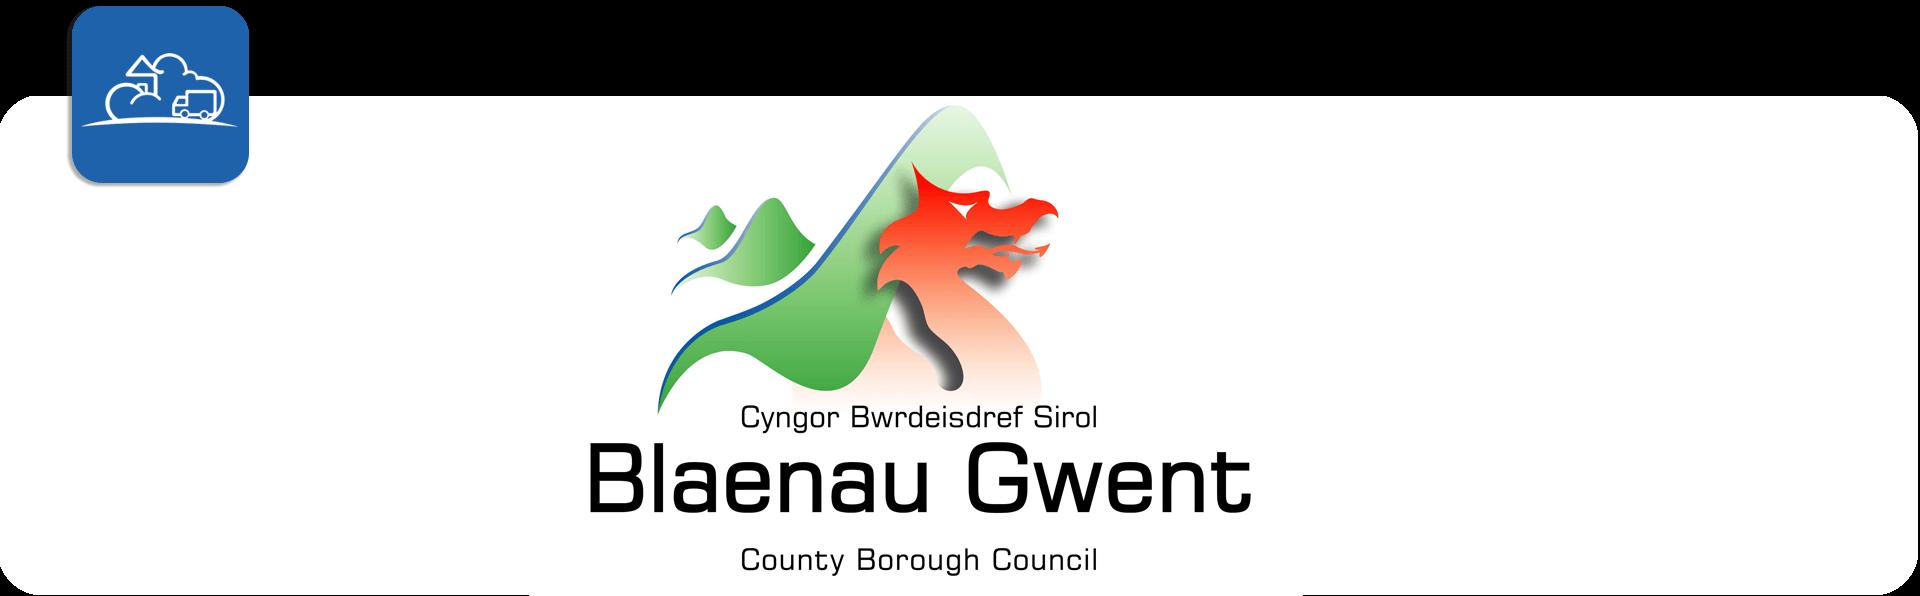 gwent council logo banner